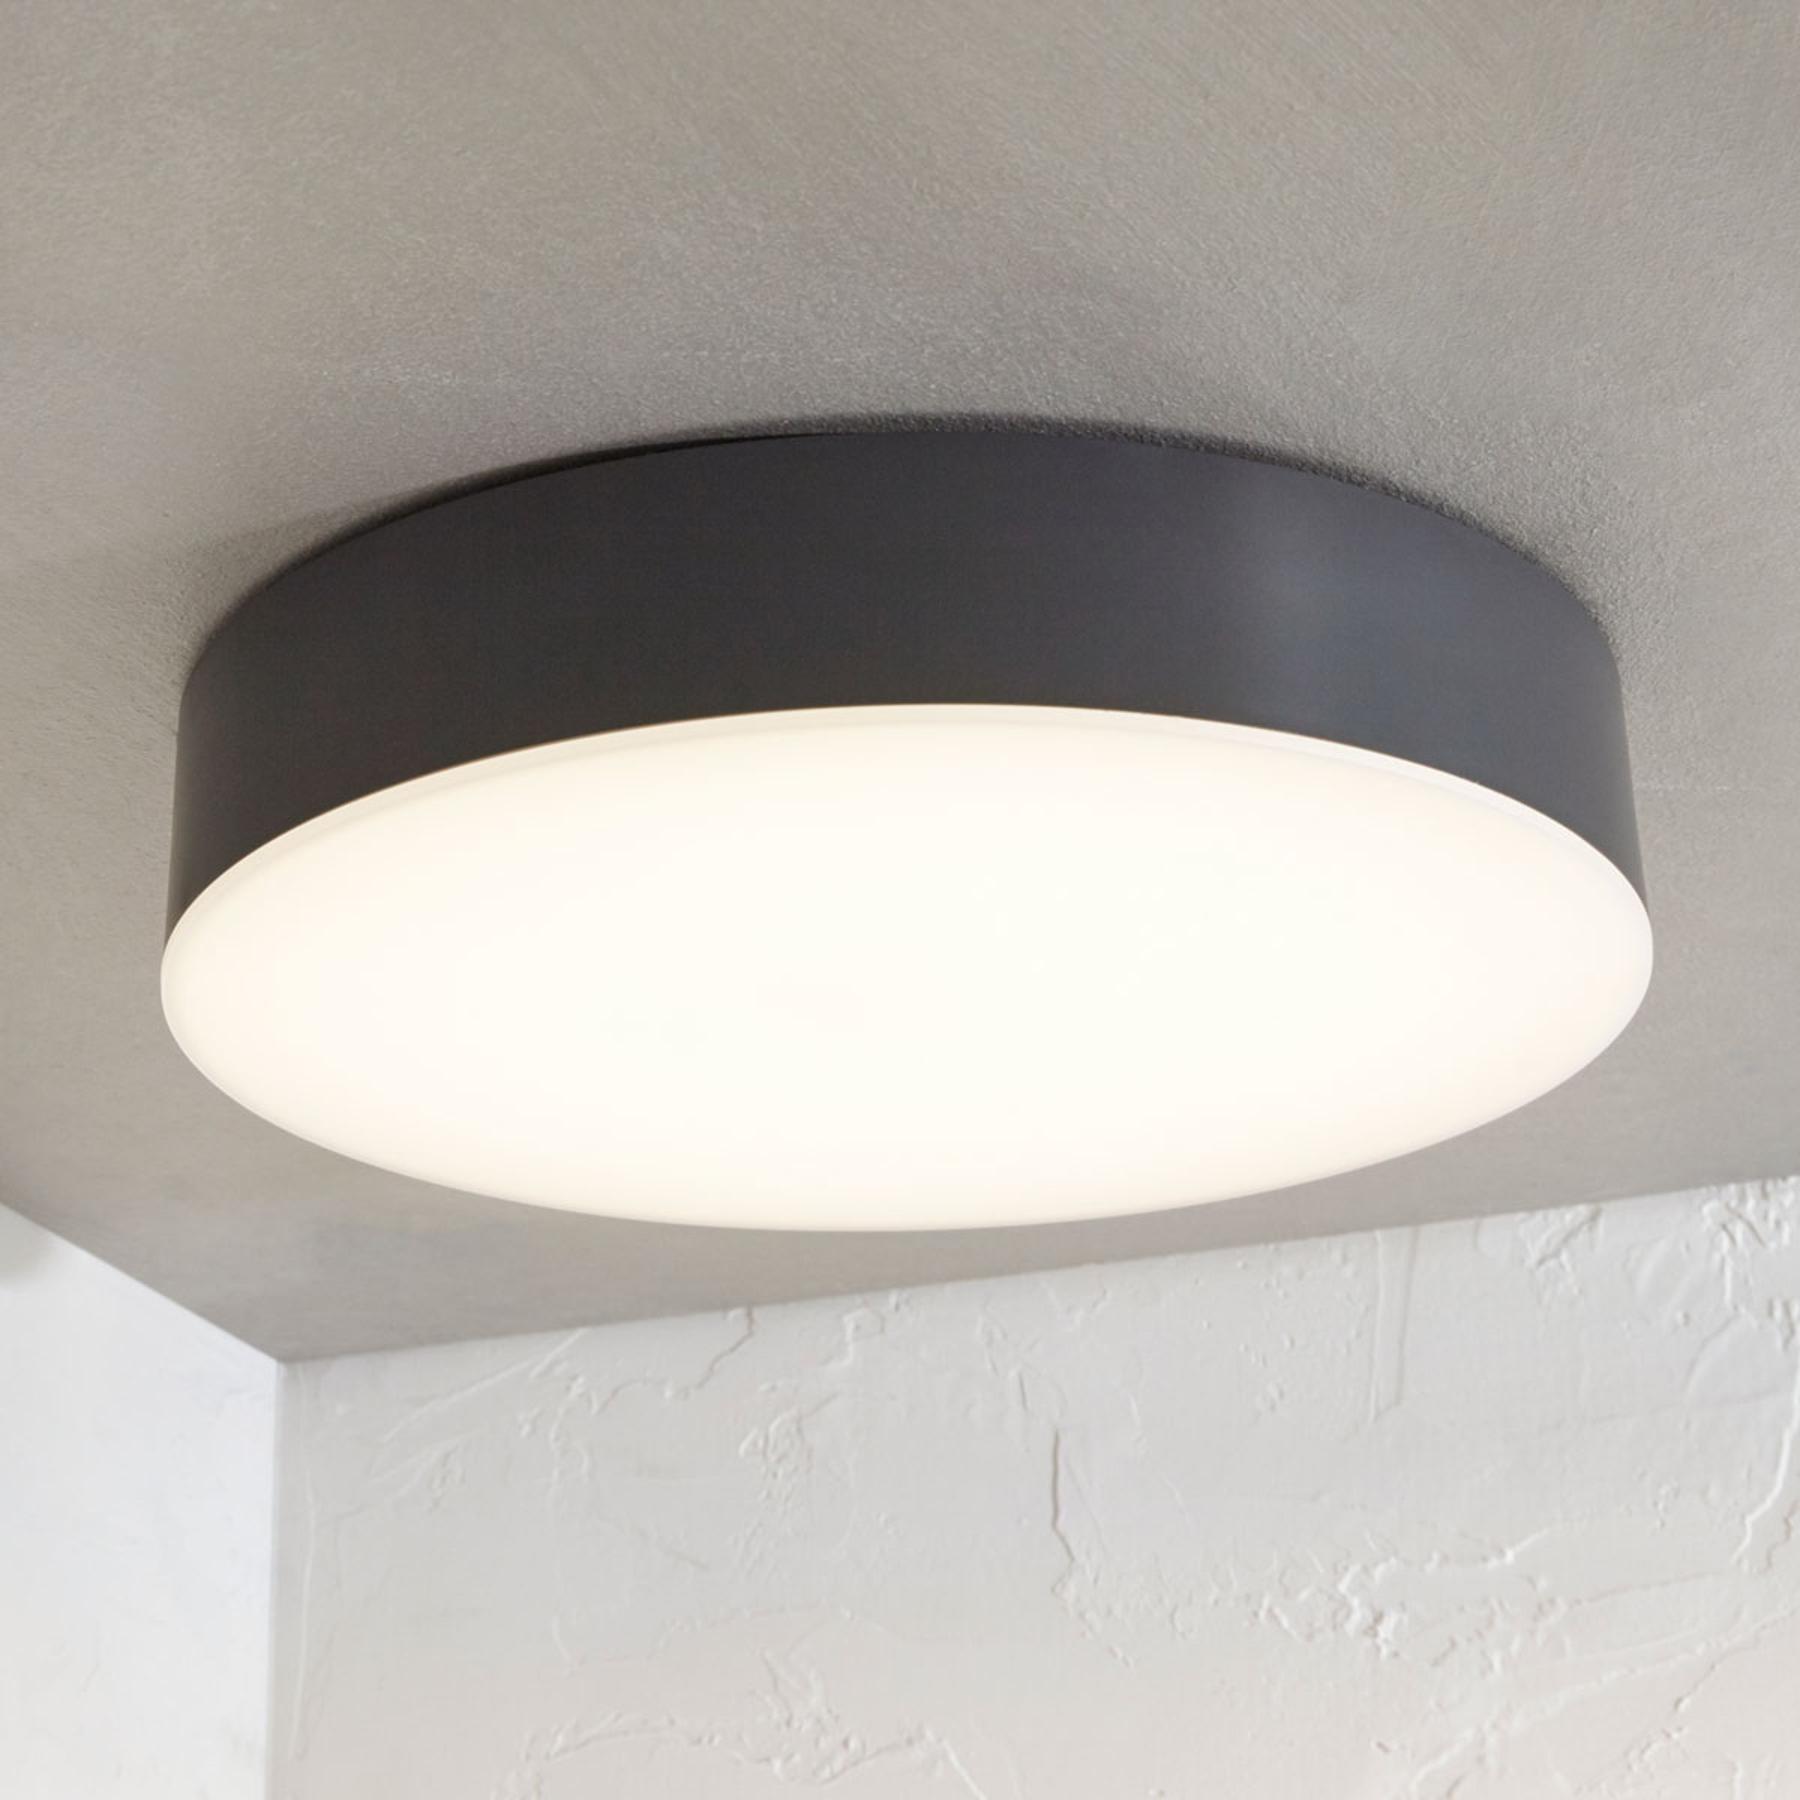 Lampa sufitowa zewn. LED Lahja, IP65, ciemnoszara